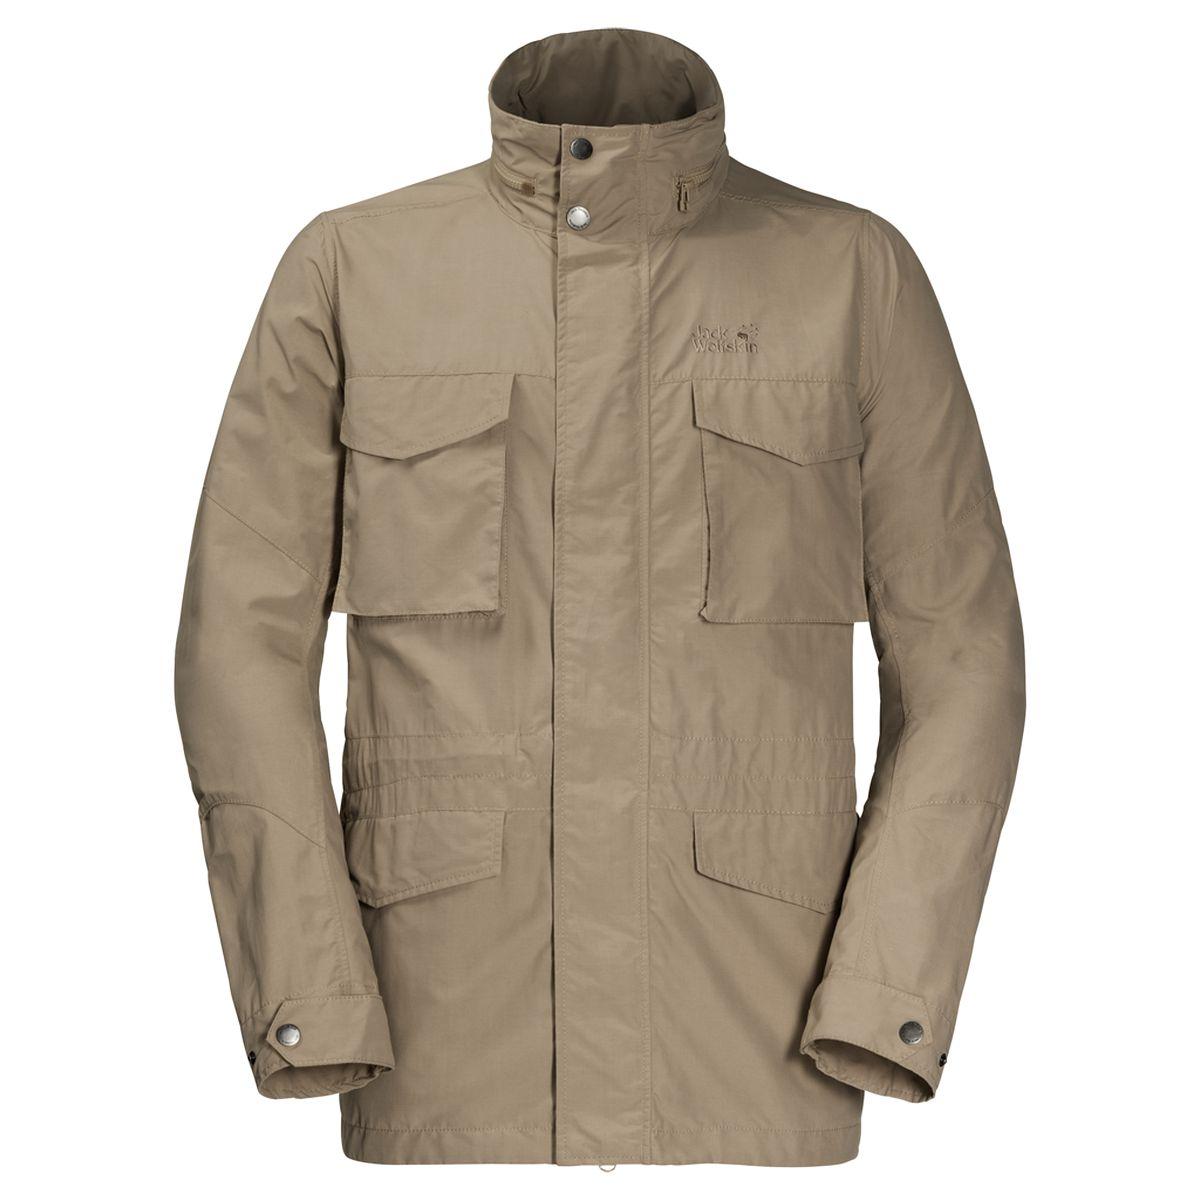 Куртка Jack Wolfskin Freemont Fieldjacket куртка мужская jack